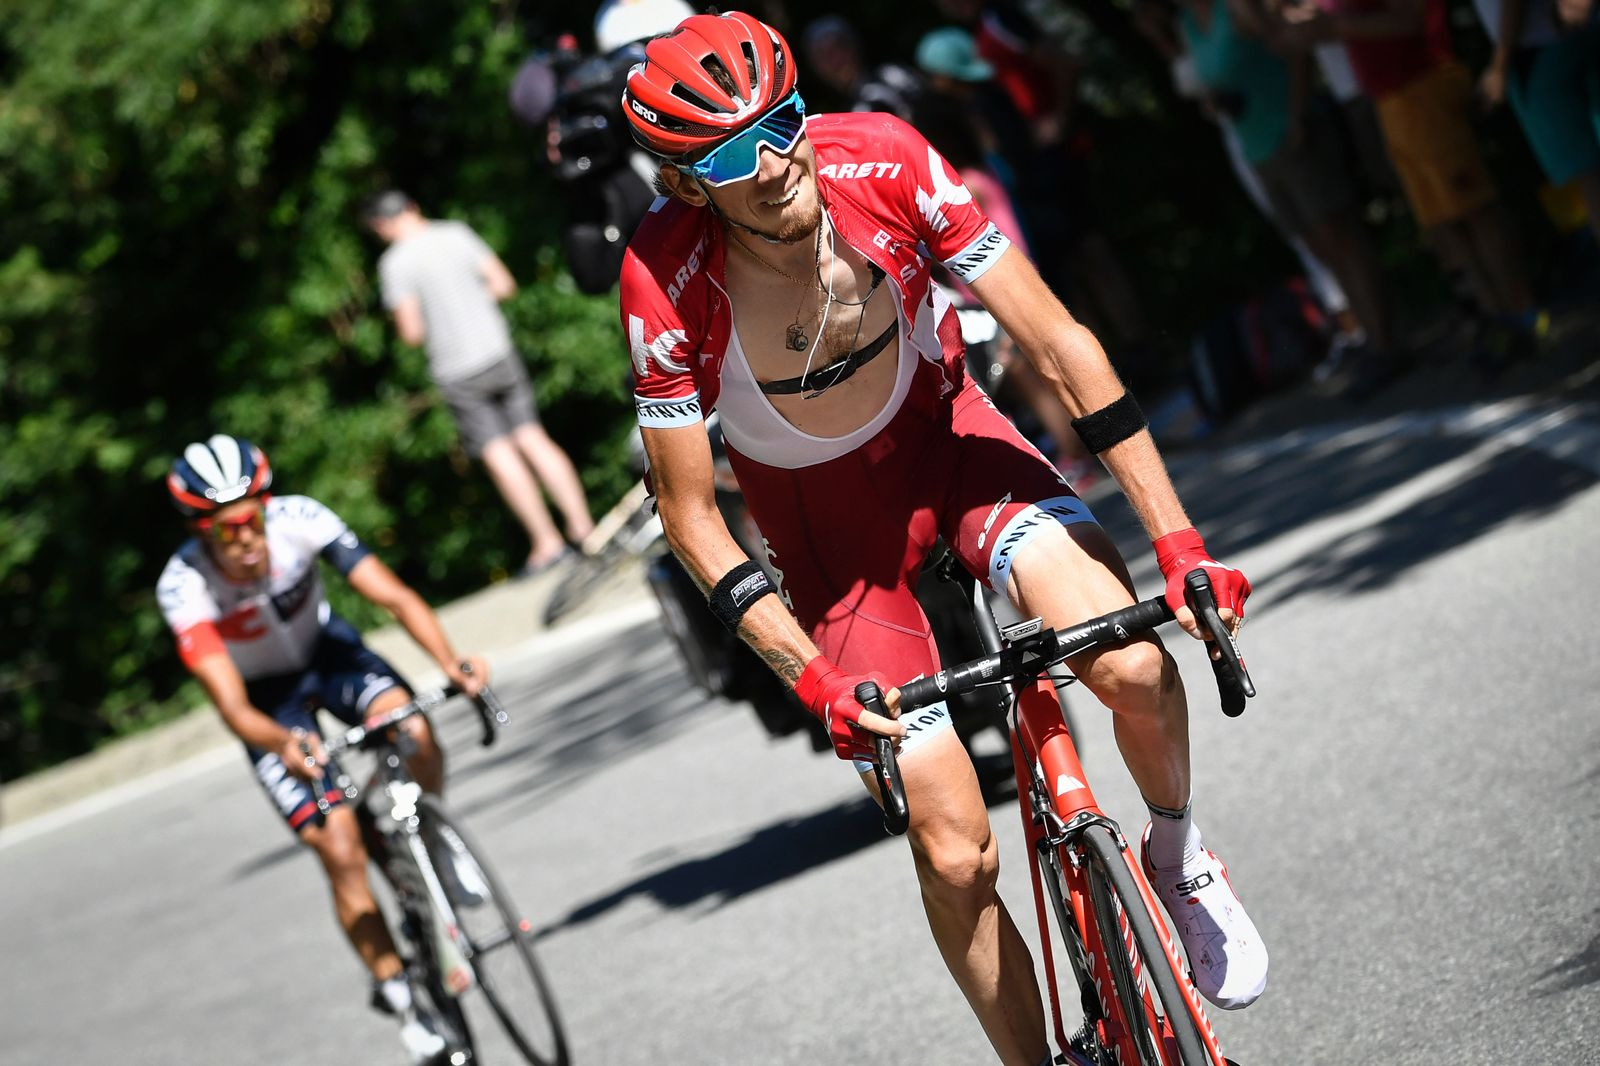 CYCLING-FRA-SUI-TDF2016-BREAKAWAY